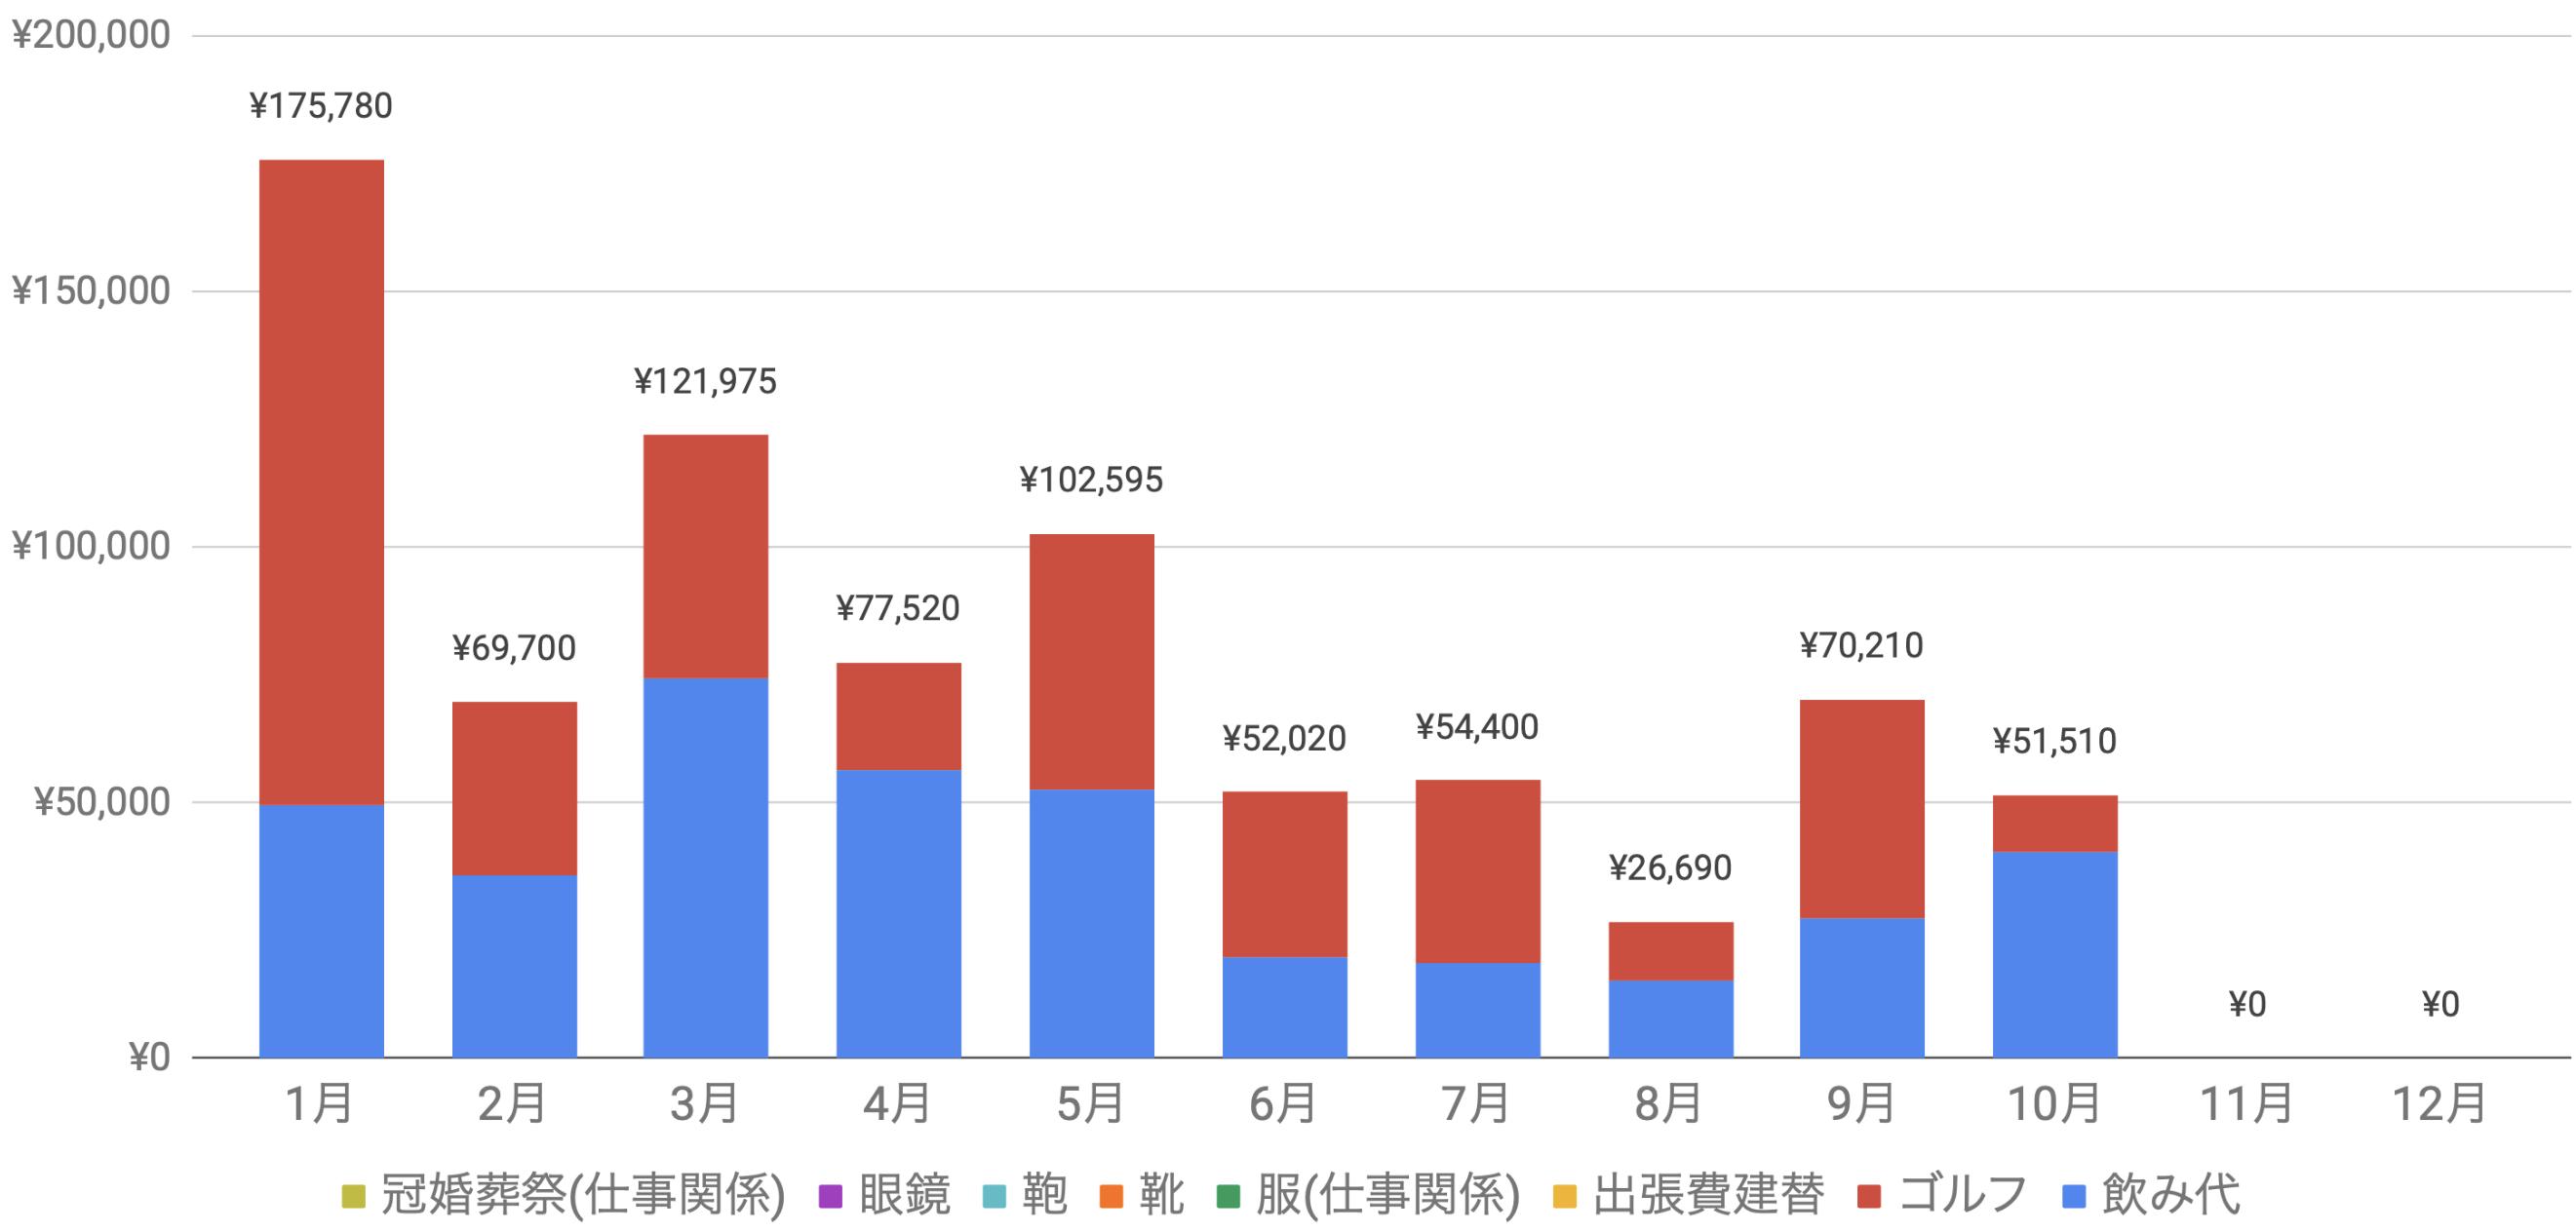 支出実績2019_10月_仕事関係費グラフ